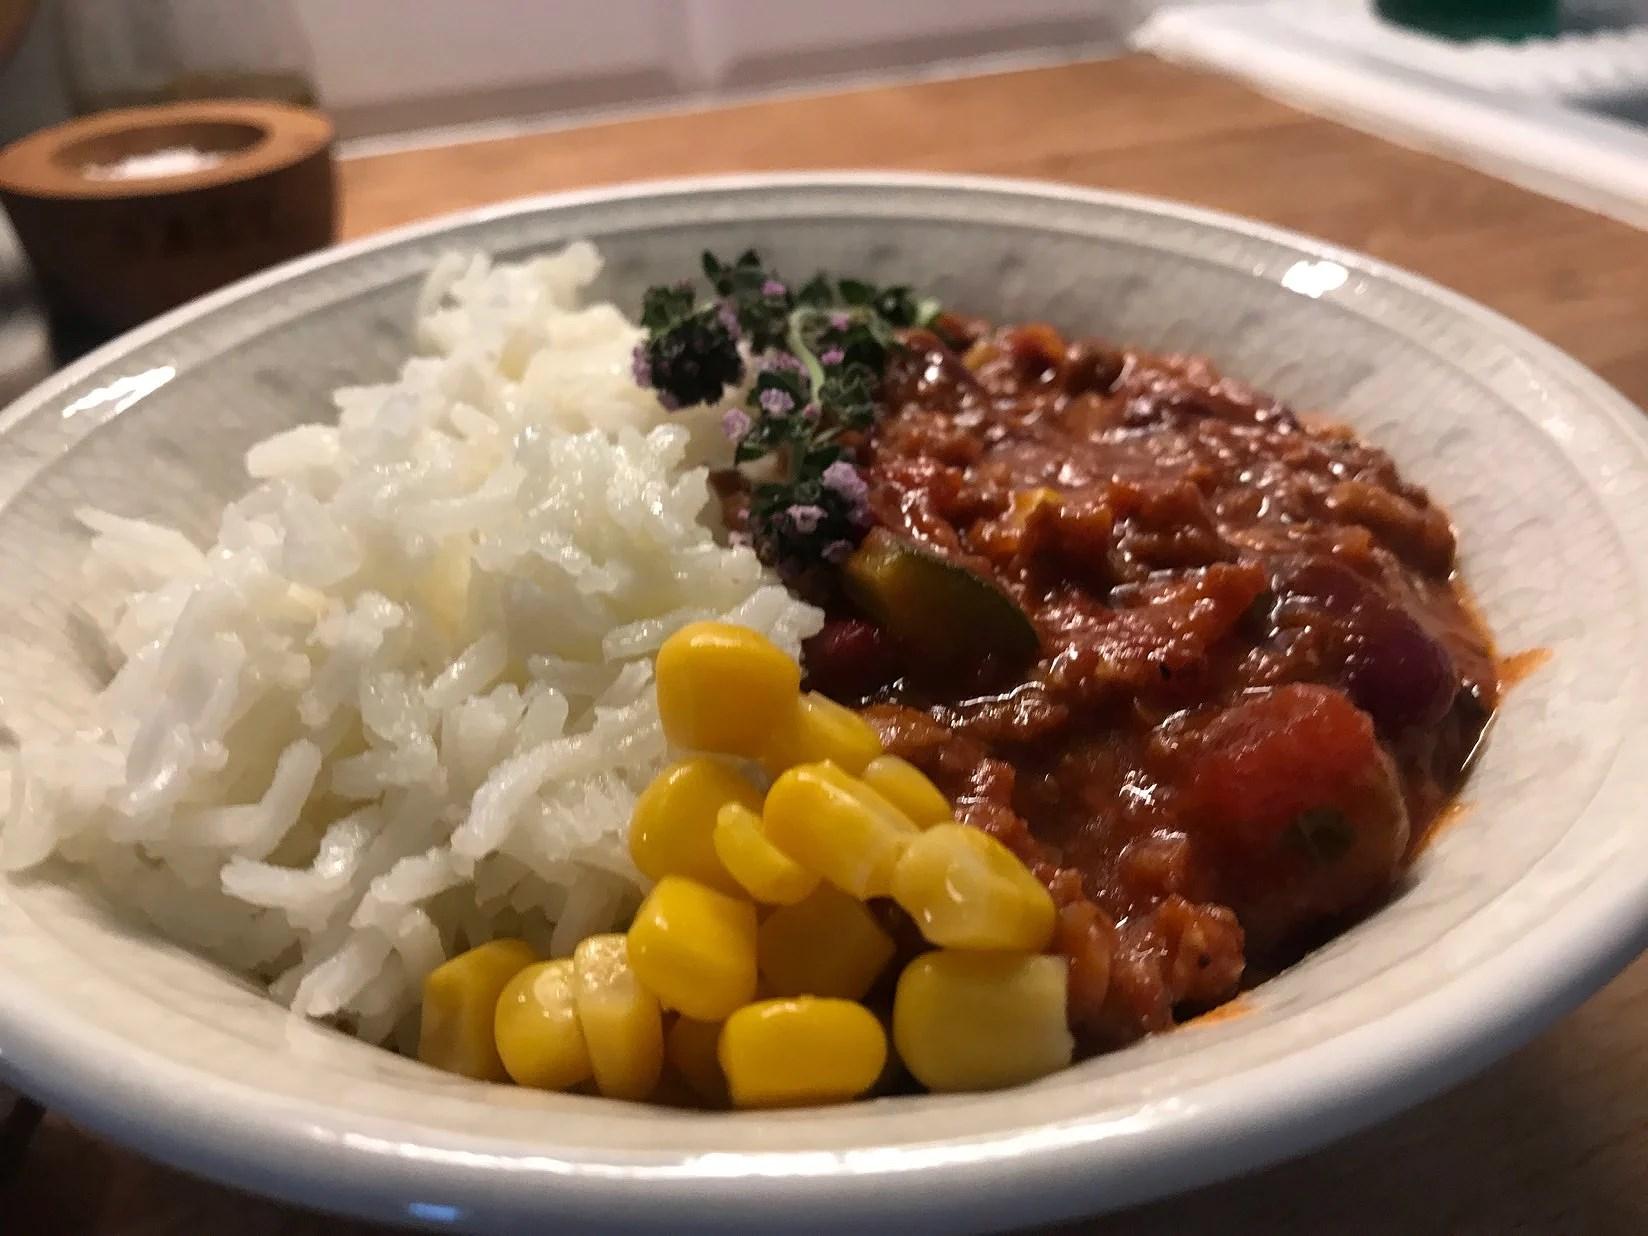 En proteinrik vegan middag efter träningen